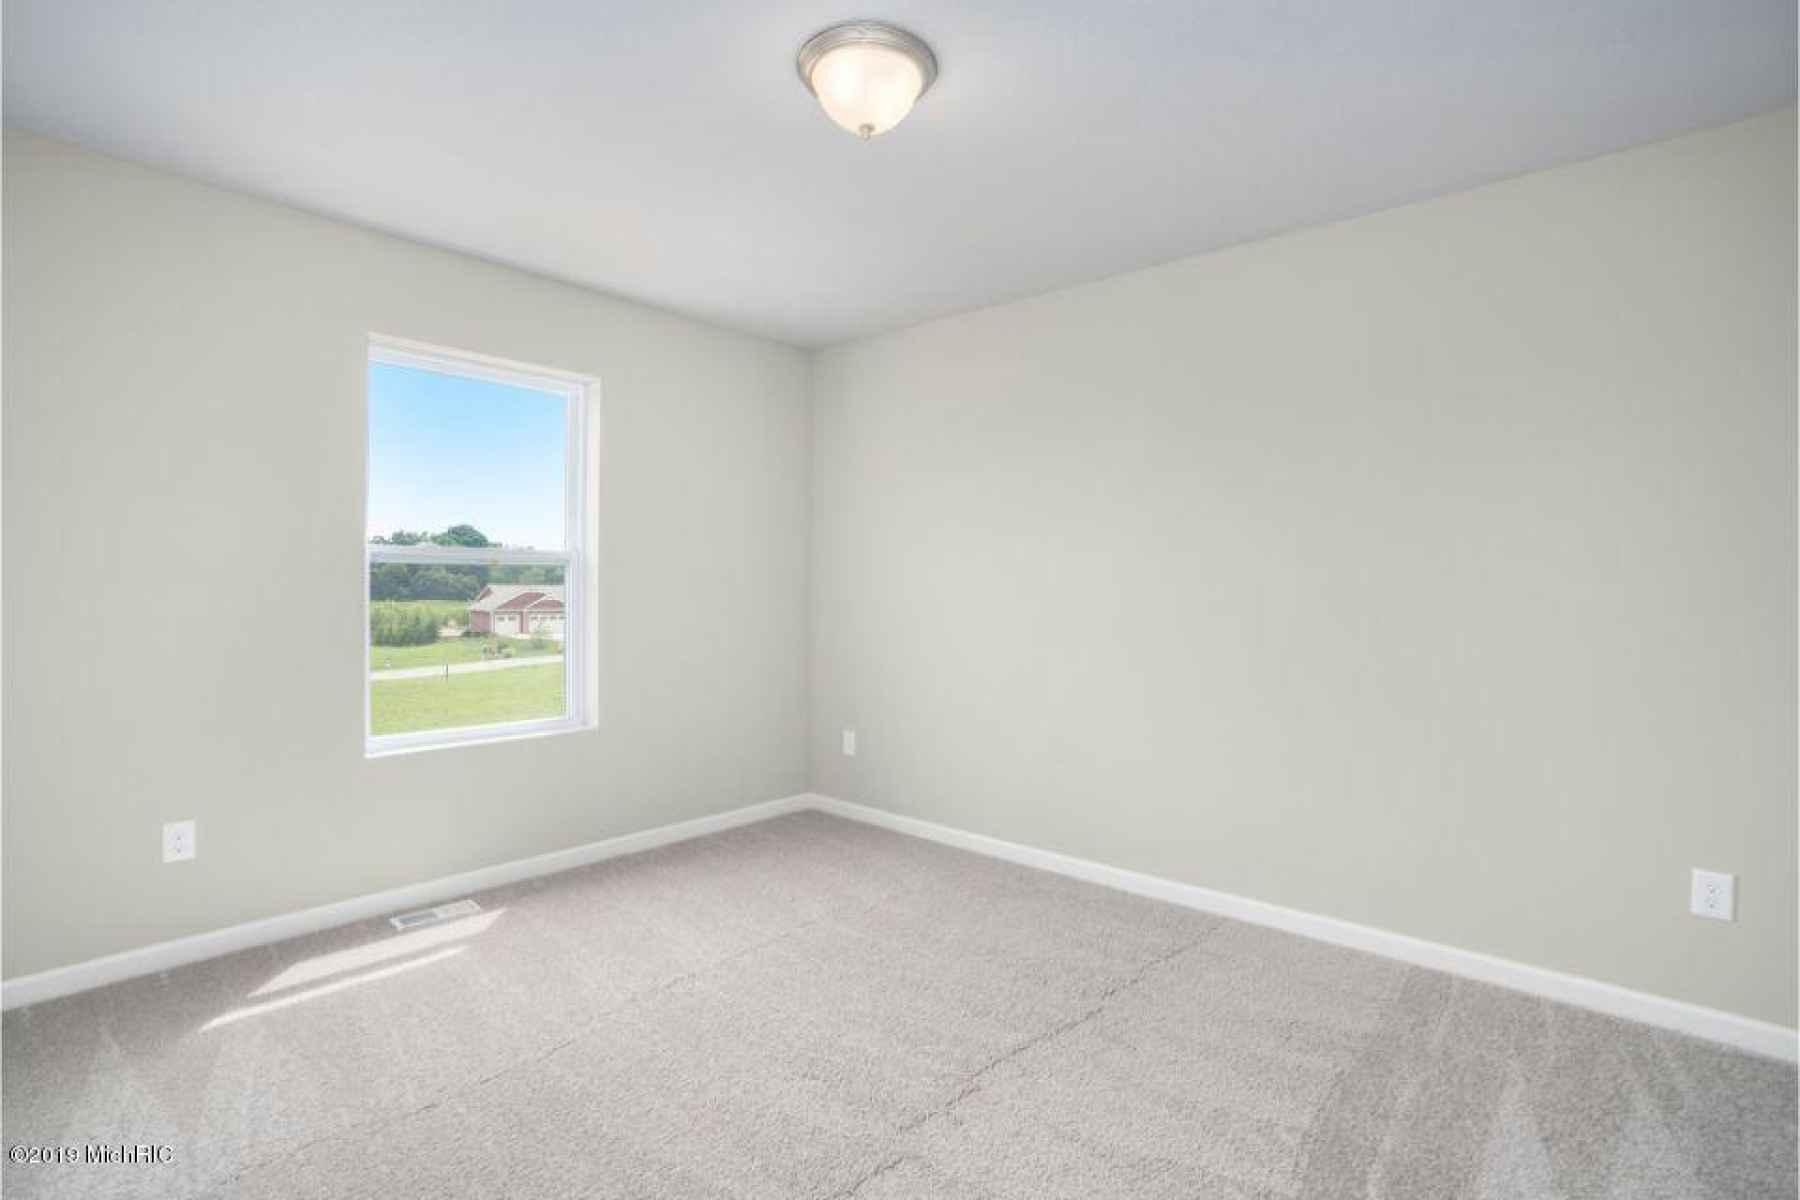 LMD097-E2070-Bedroom2